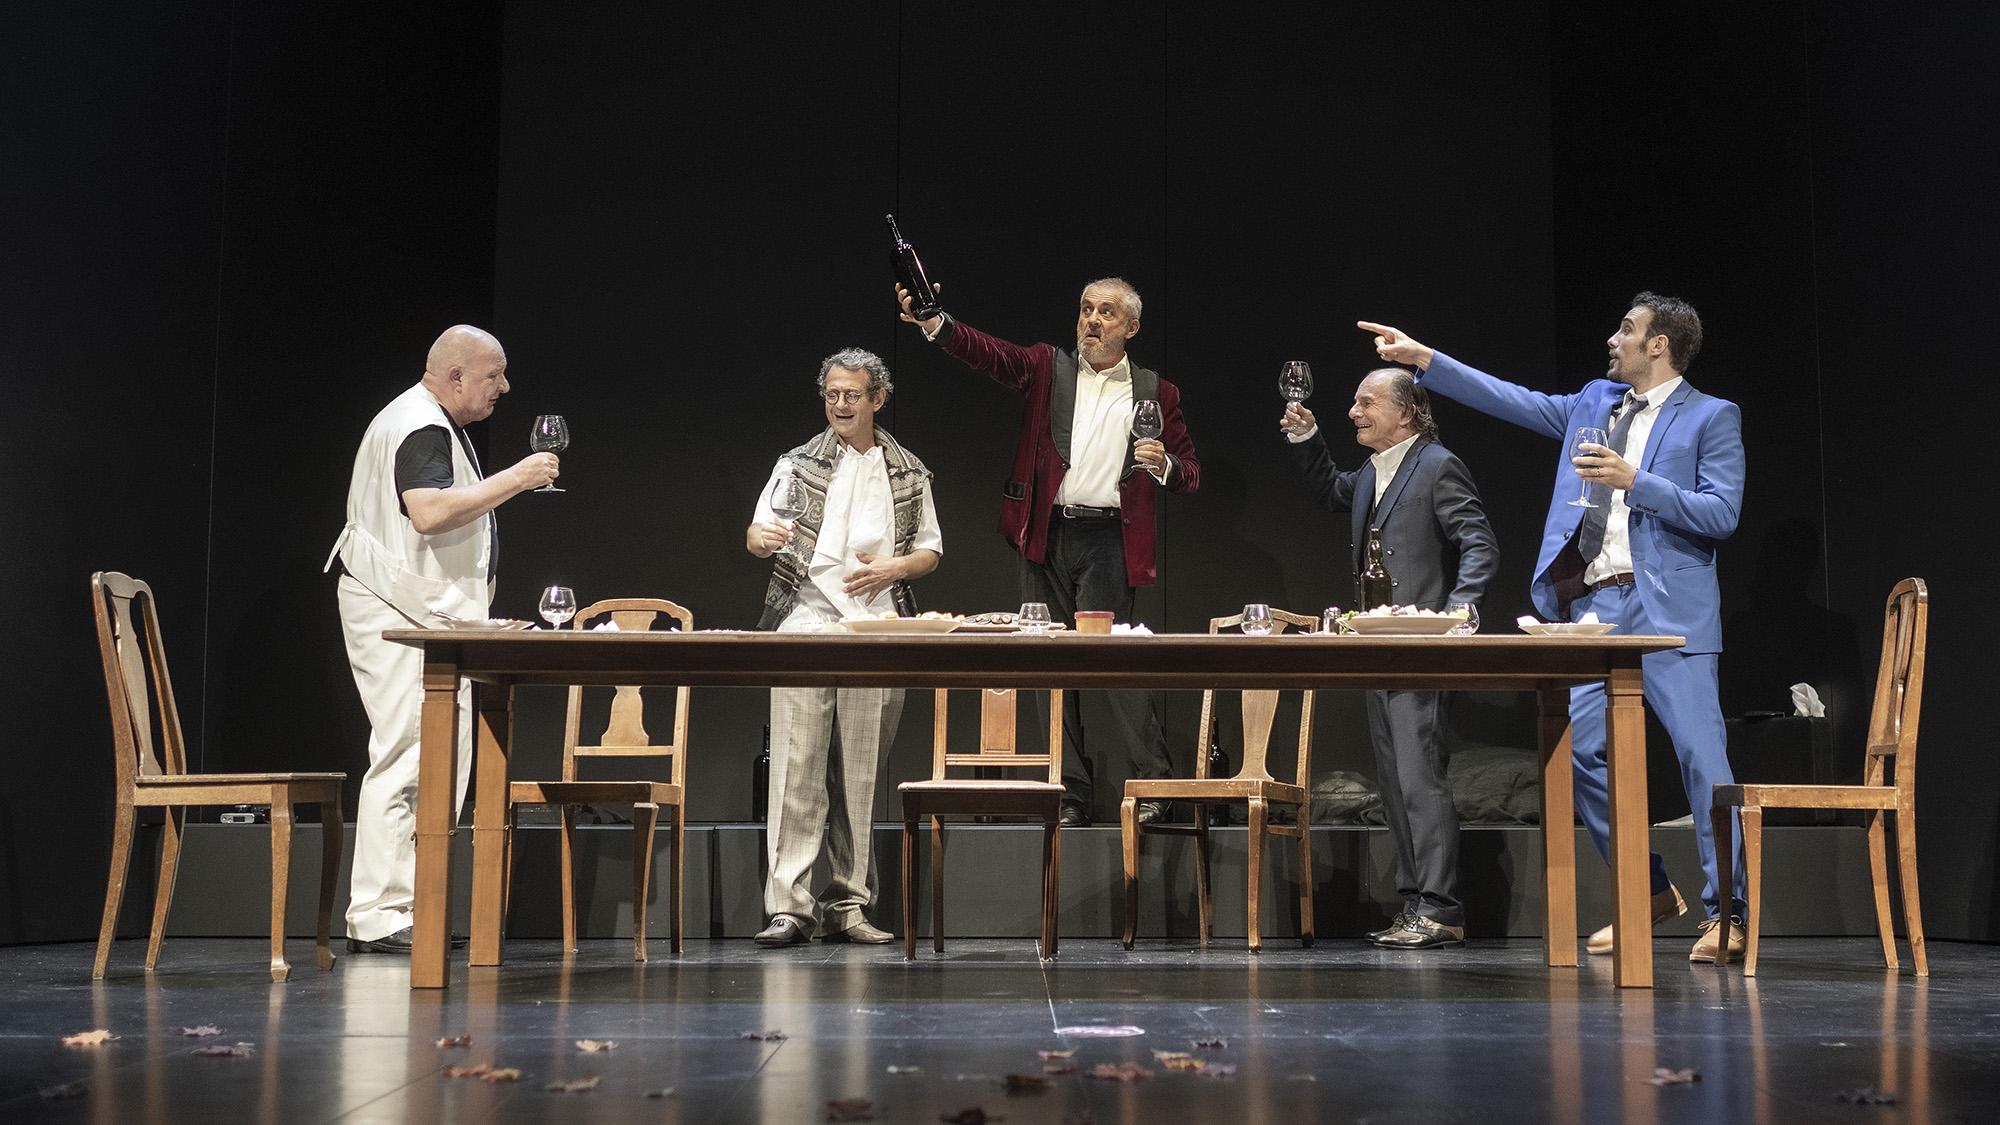 Die Panne, Friedrich Dürrenmatt, TOBS, Stadttheater Solothurn